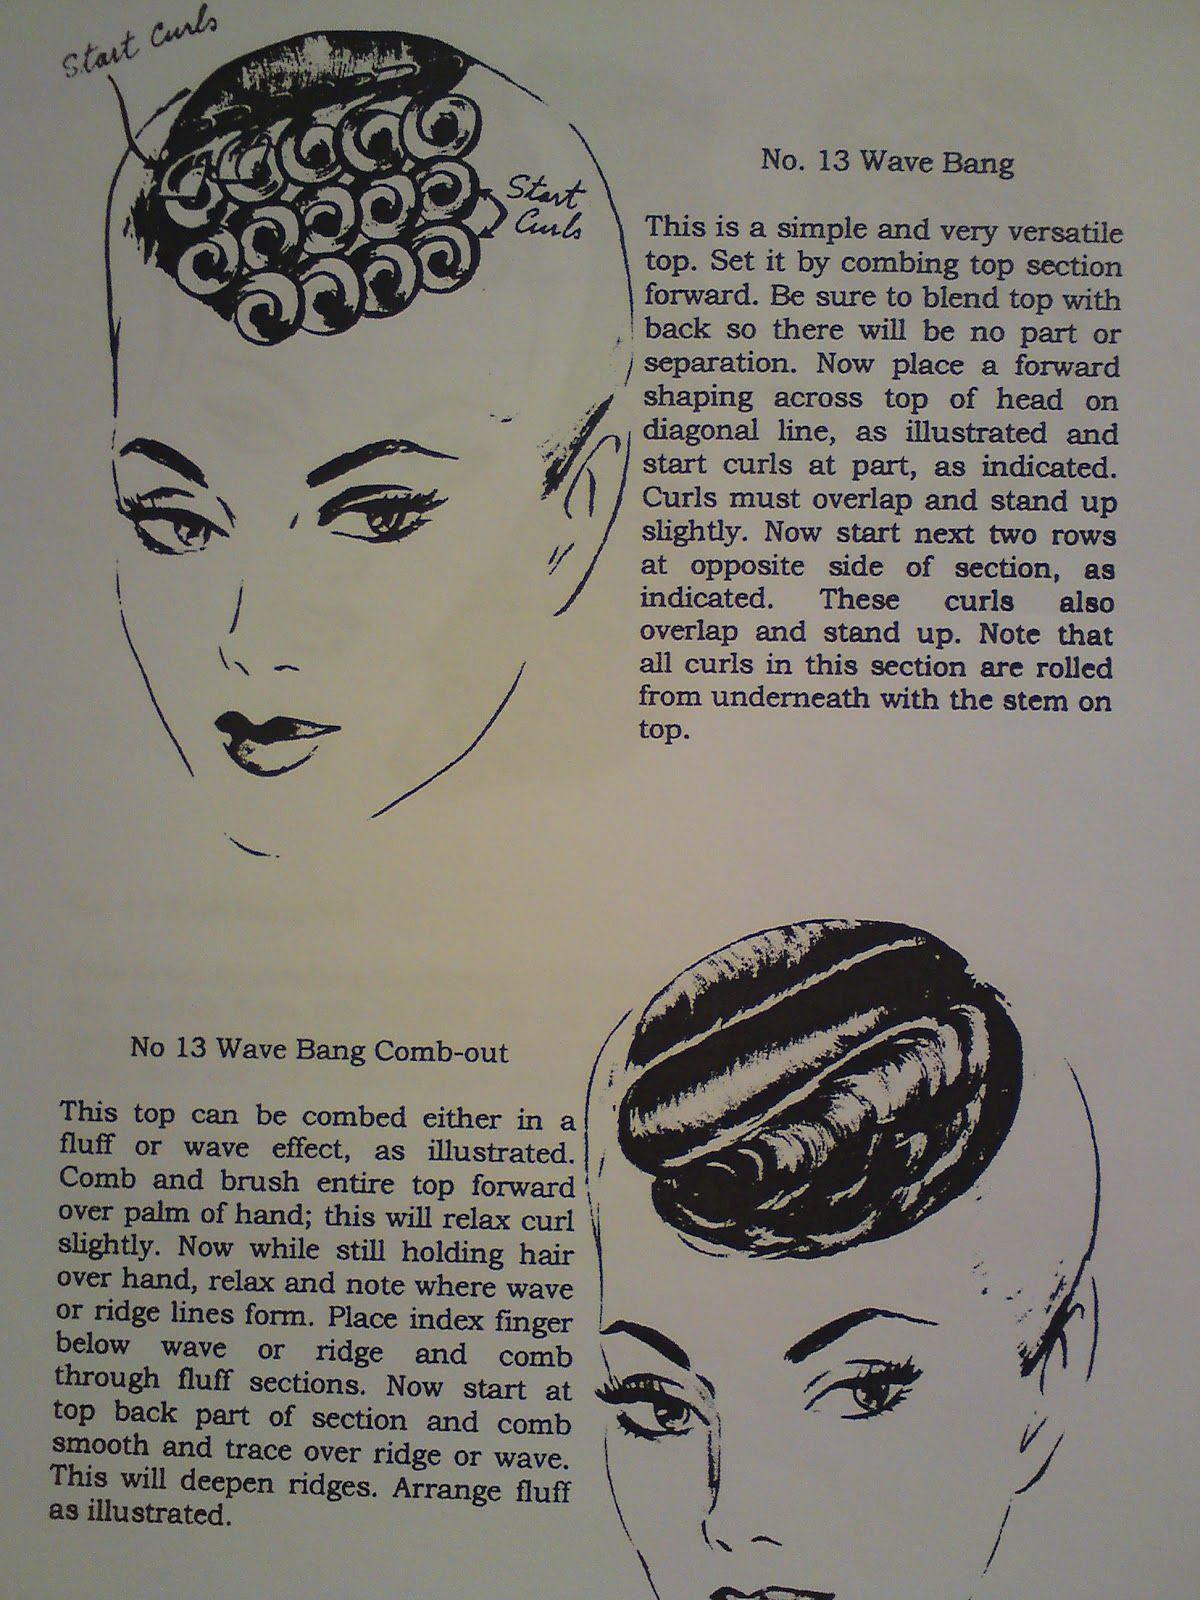 vintage pin curls diagram nervous tissue curl instructional culturebee co how to make wave bangs hair tutorial rh pinterest com roller set placement diagrams